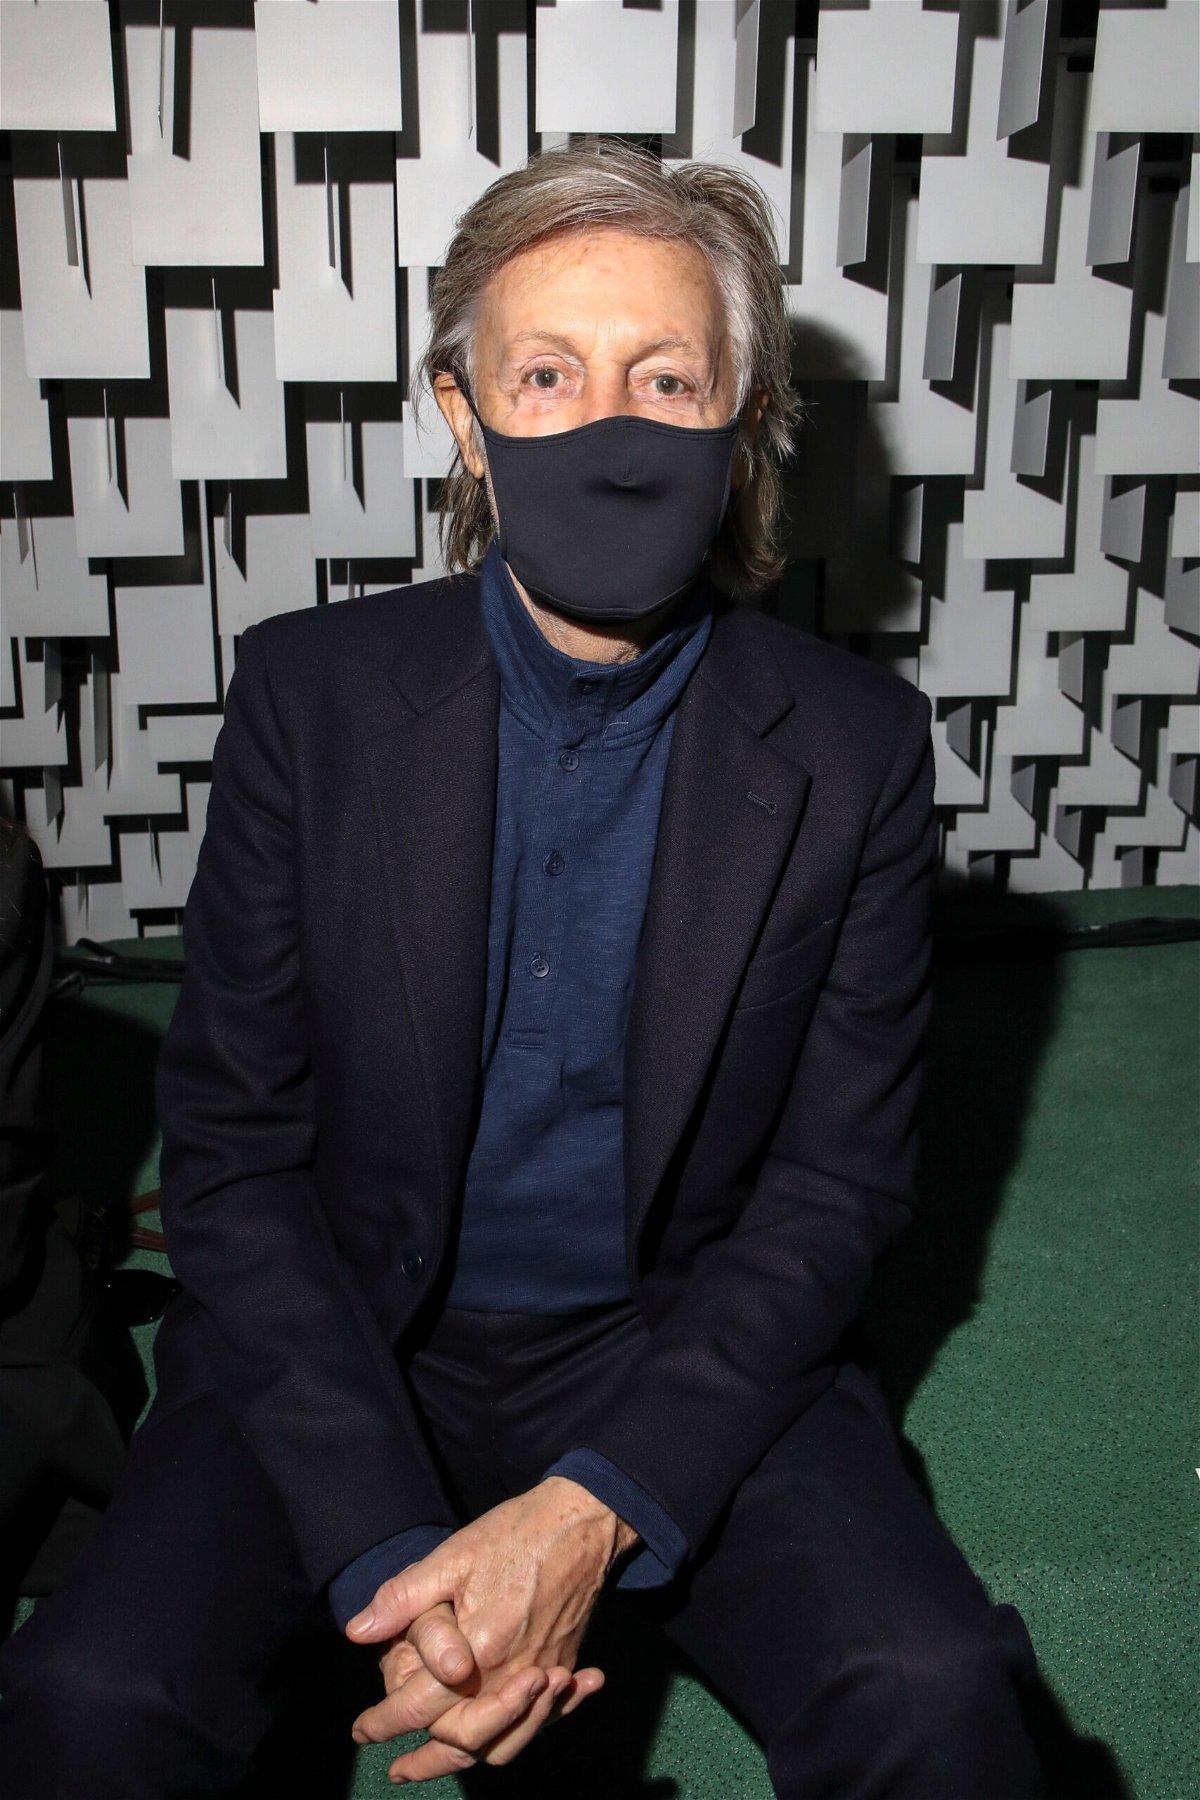 <i>Vianney Le Caer/Invision/AP</i><br/>Beatles legend Paul McCartney has dubbed the Rolling Stones